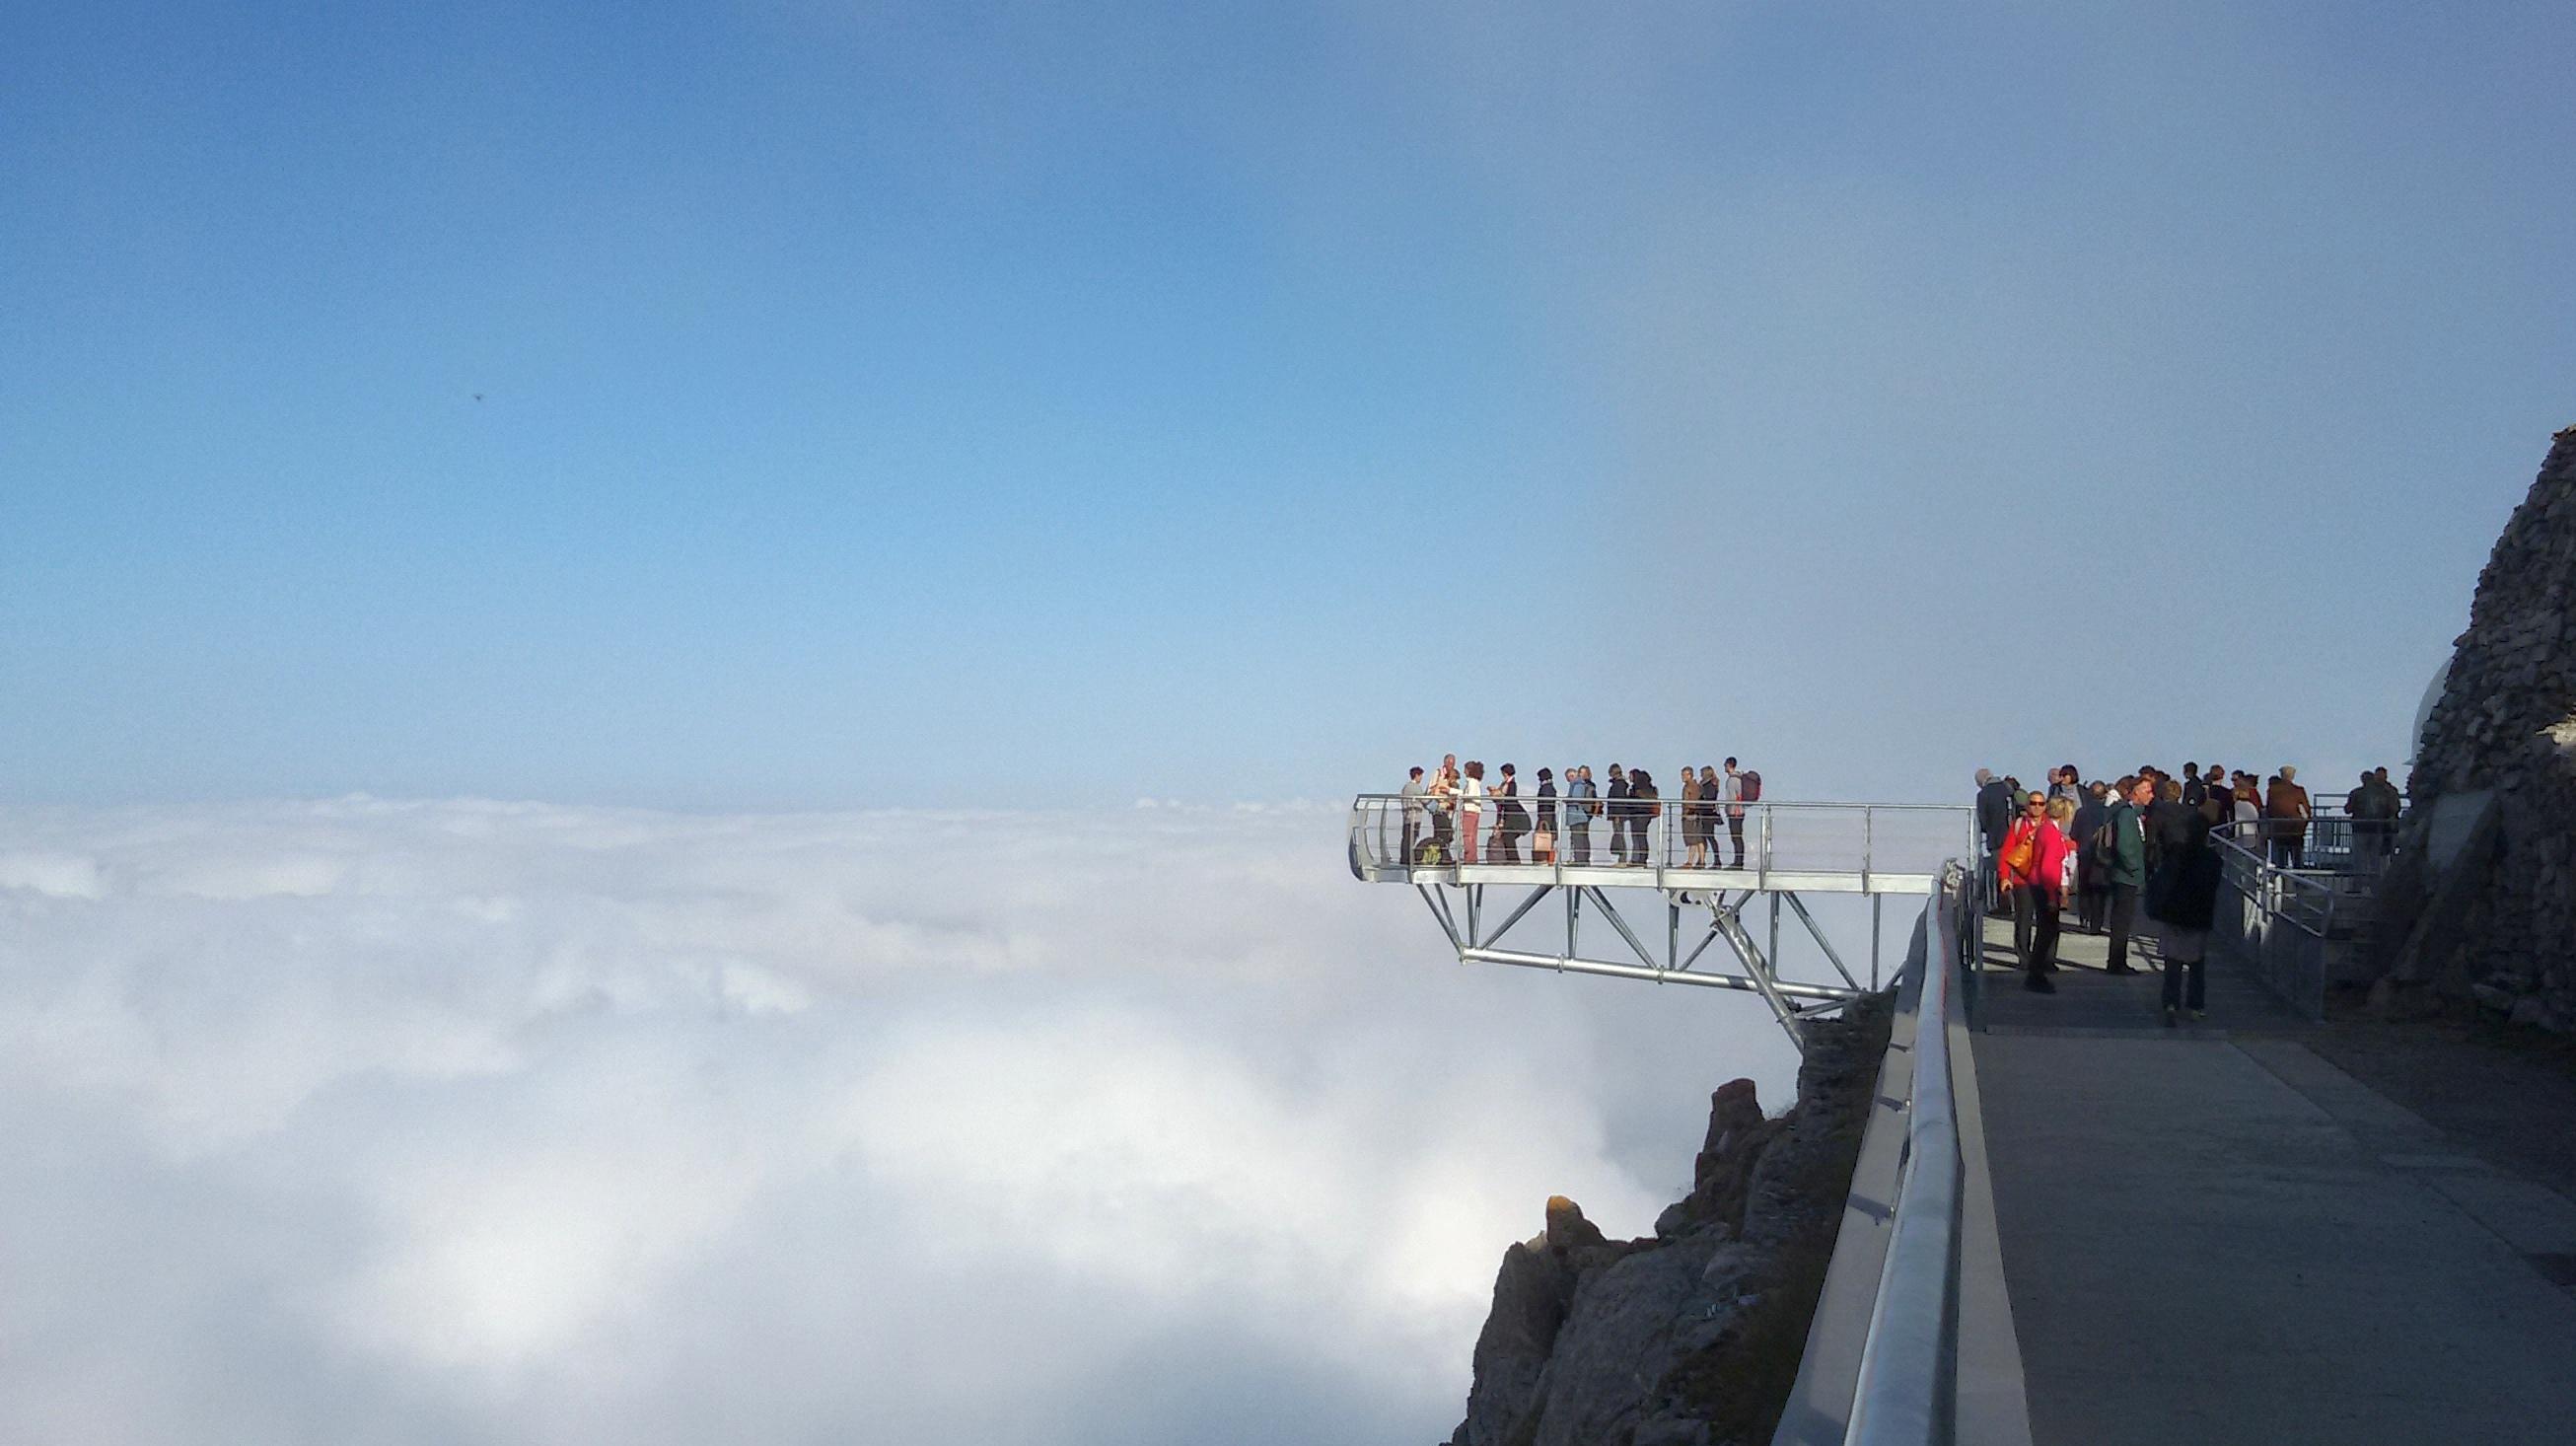 Pontone panoramico nell'Osservatorio del Pic du Midi